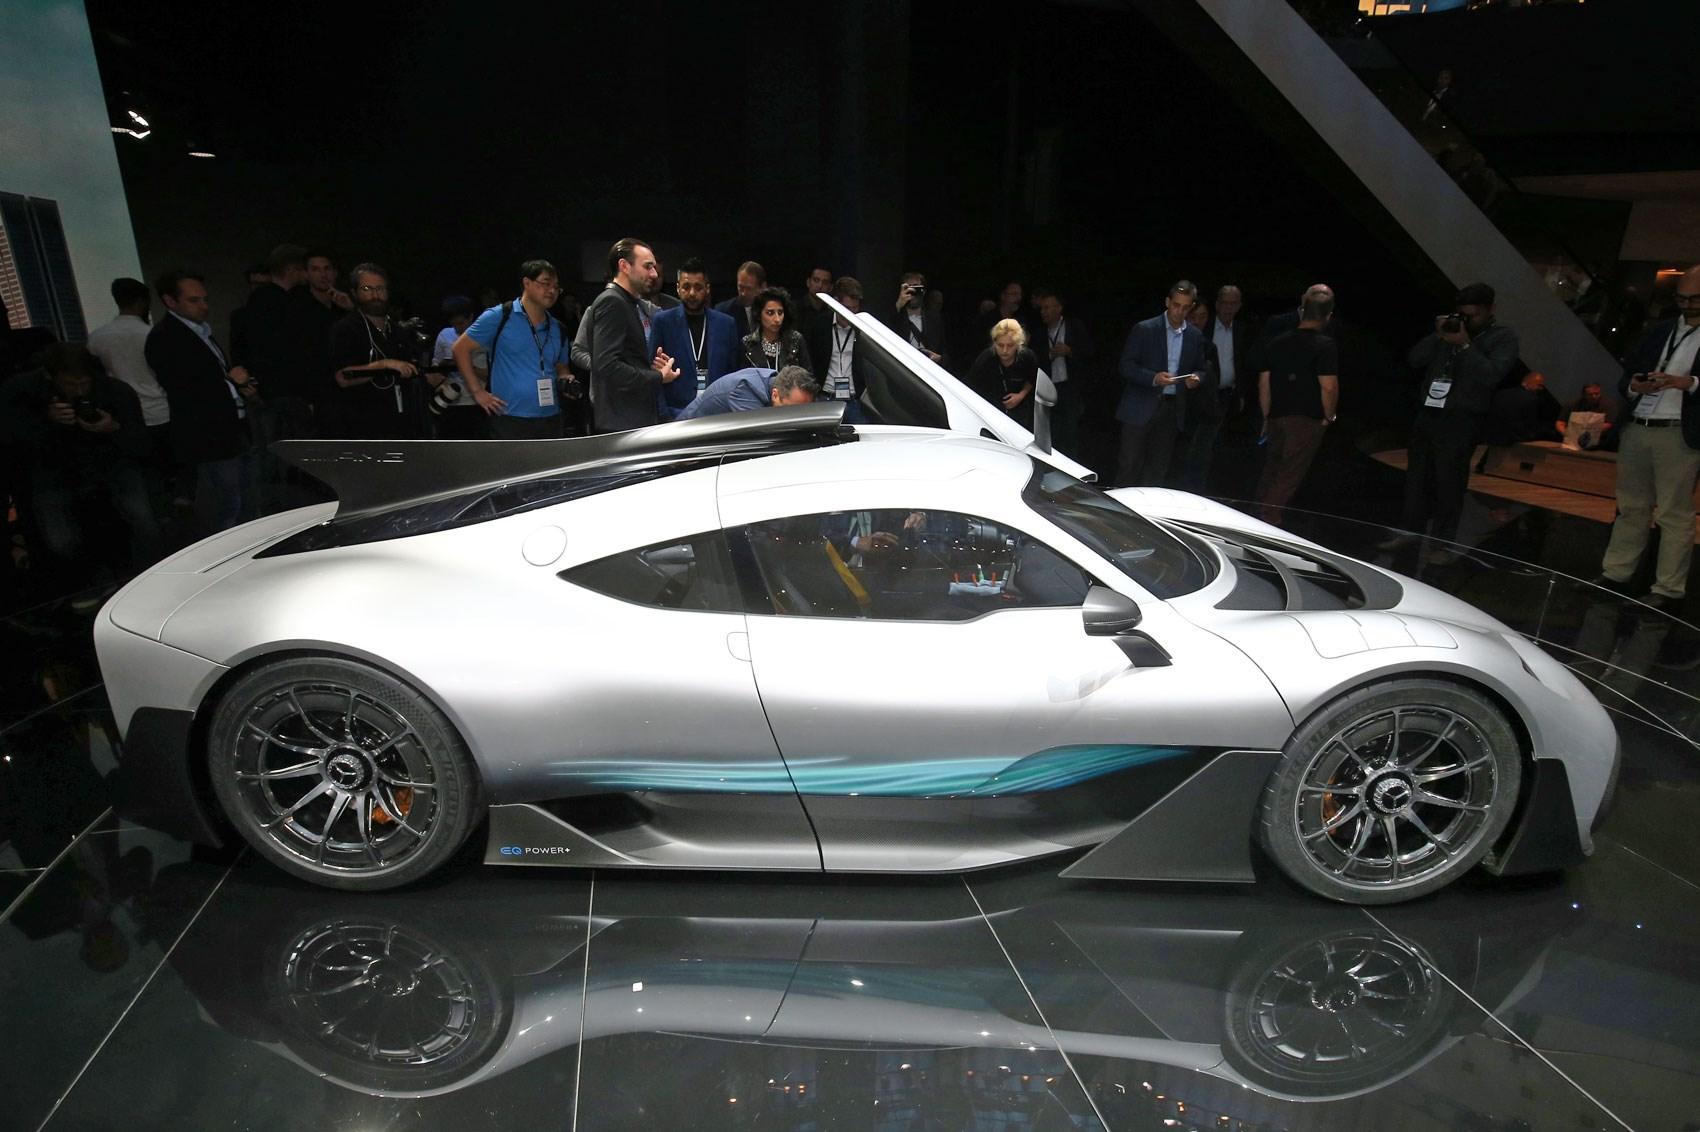 Opiniones del nuevo mercedes amg project one forocoches for Mercedes benz amg project one